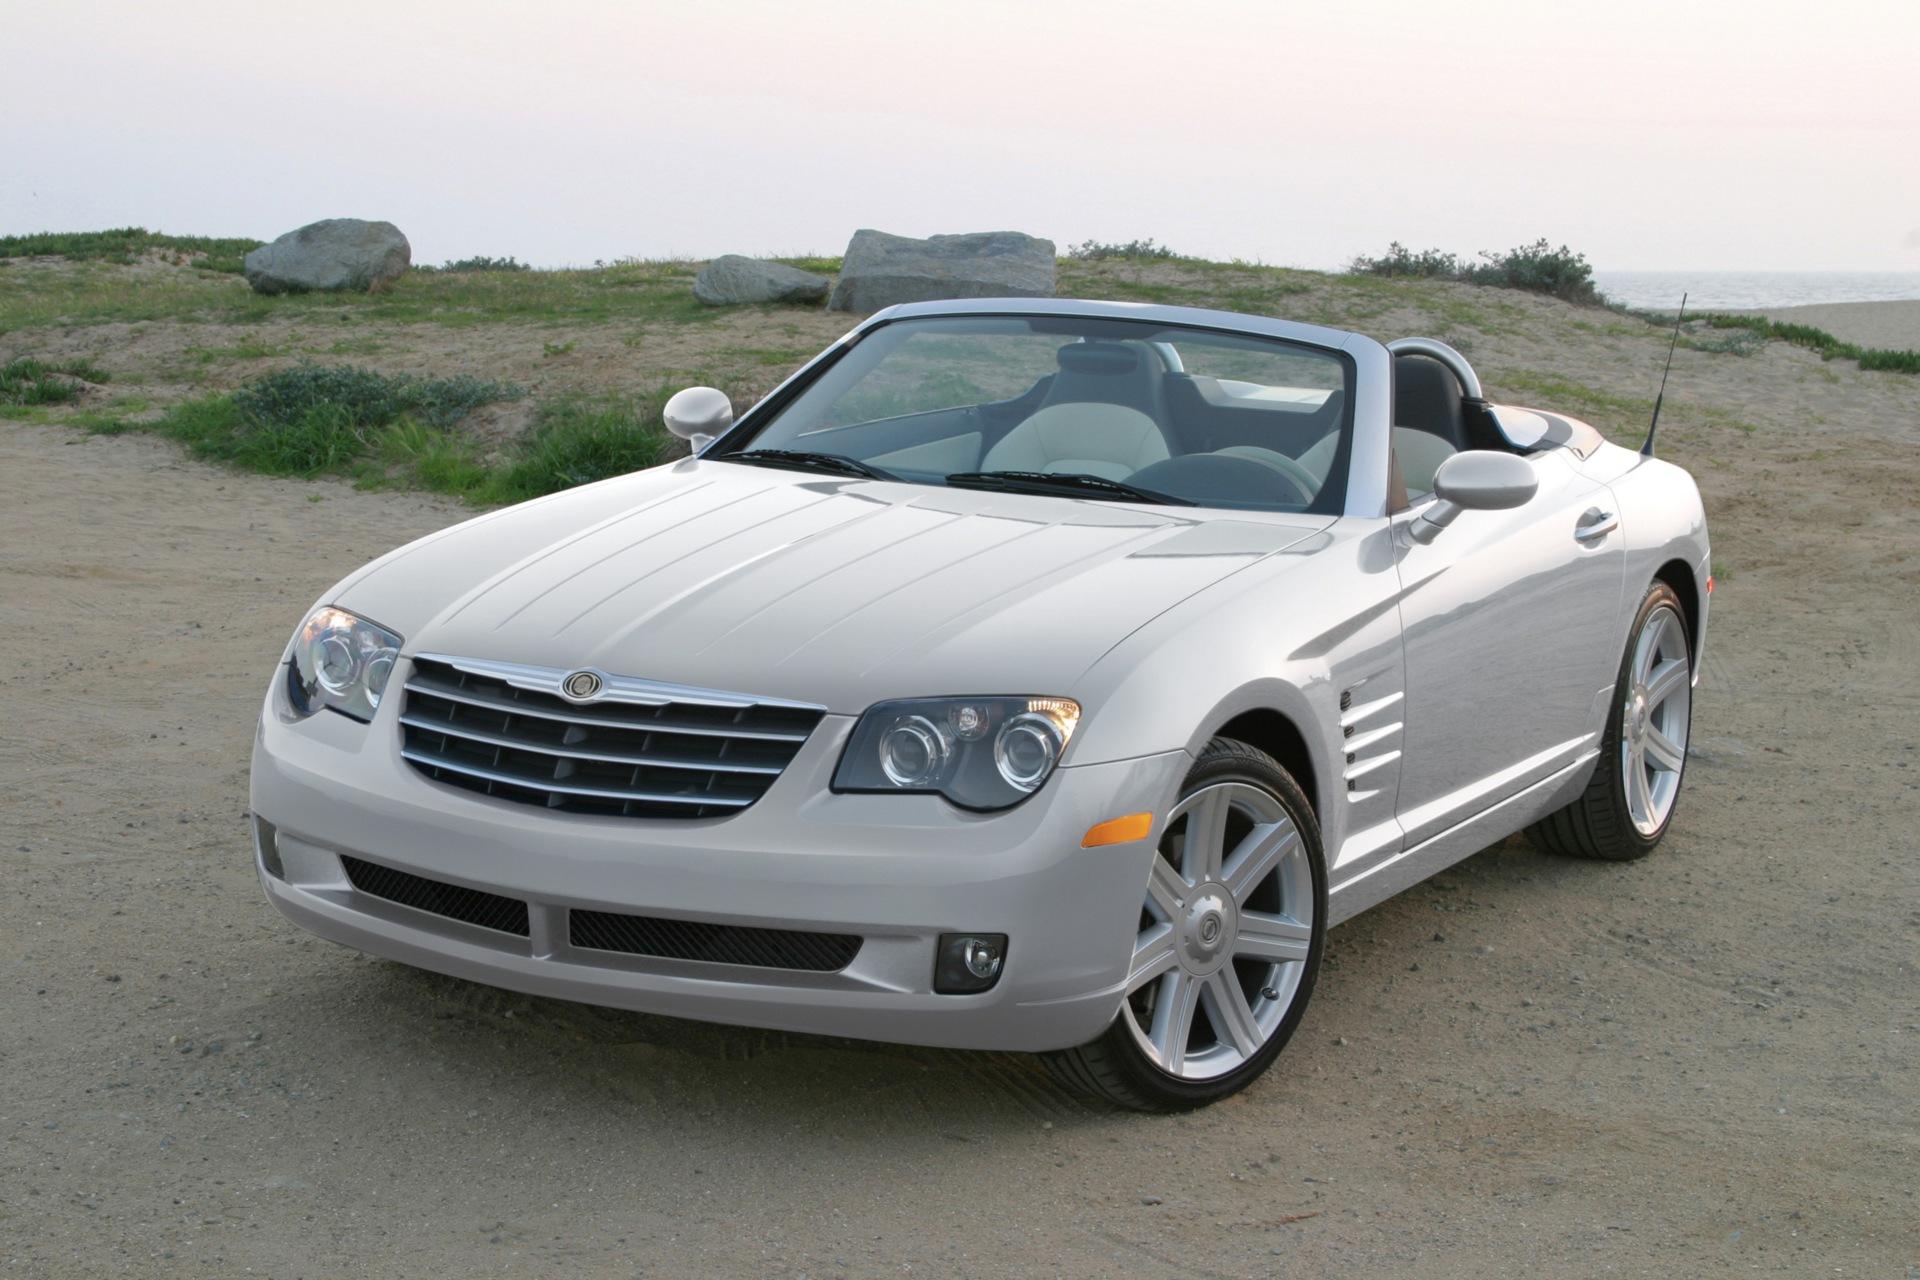 Chrysler Crossfire 2003 - 2007 Cabriolet #4